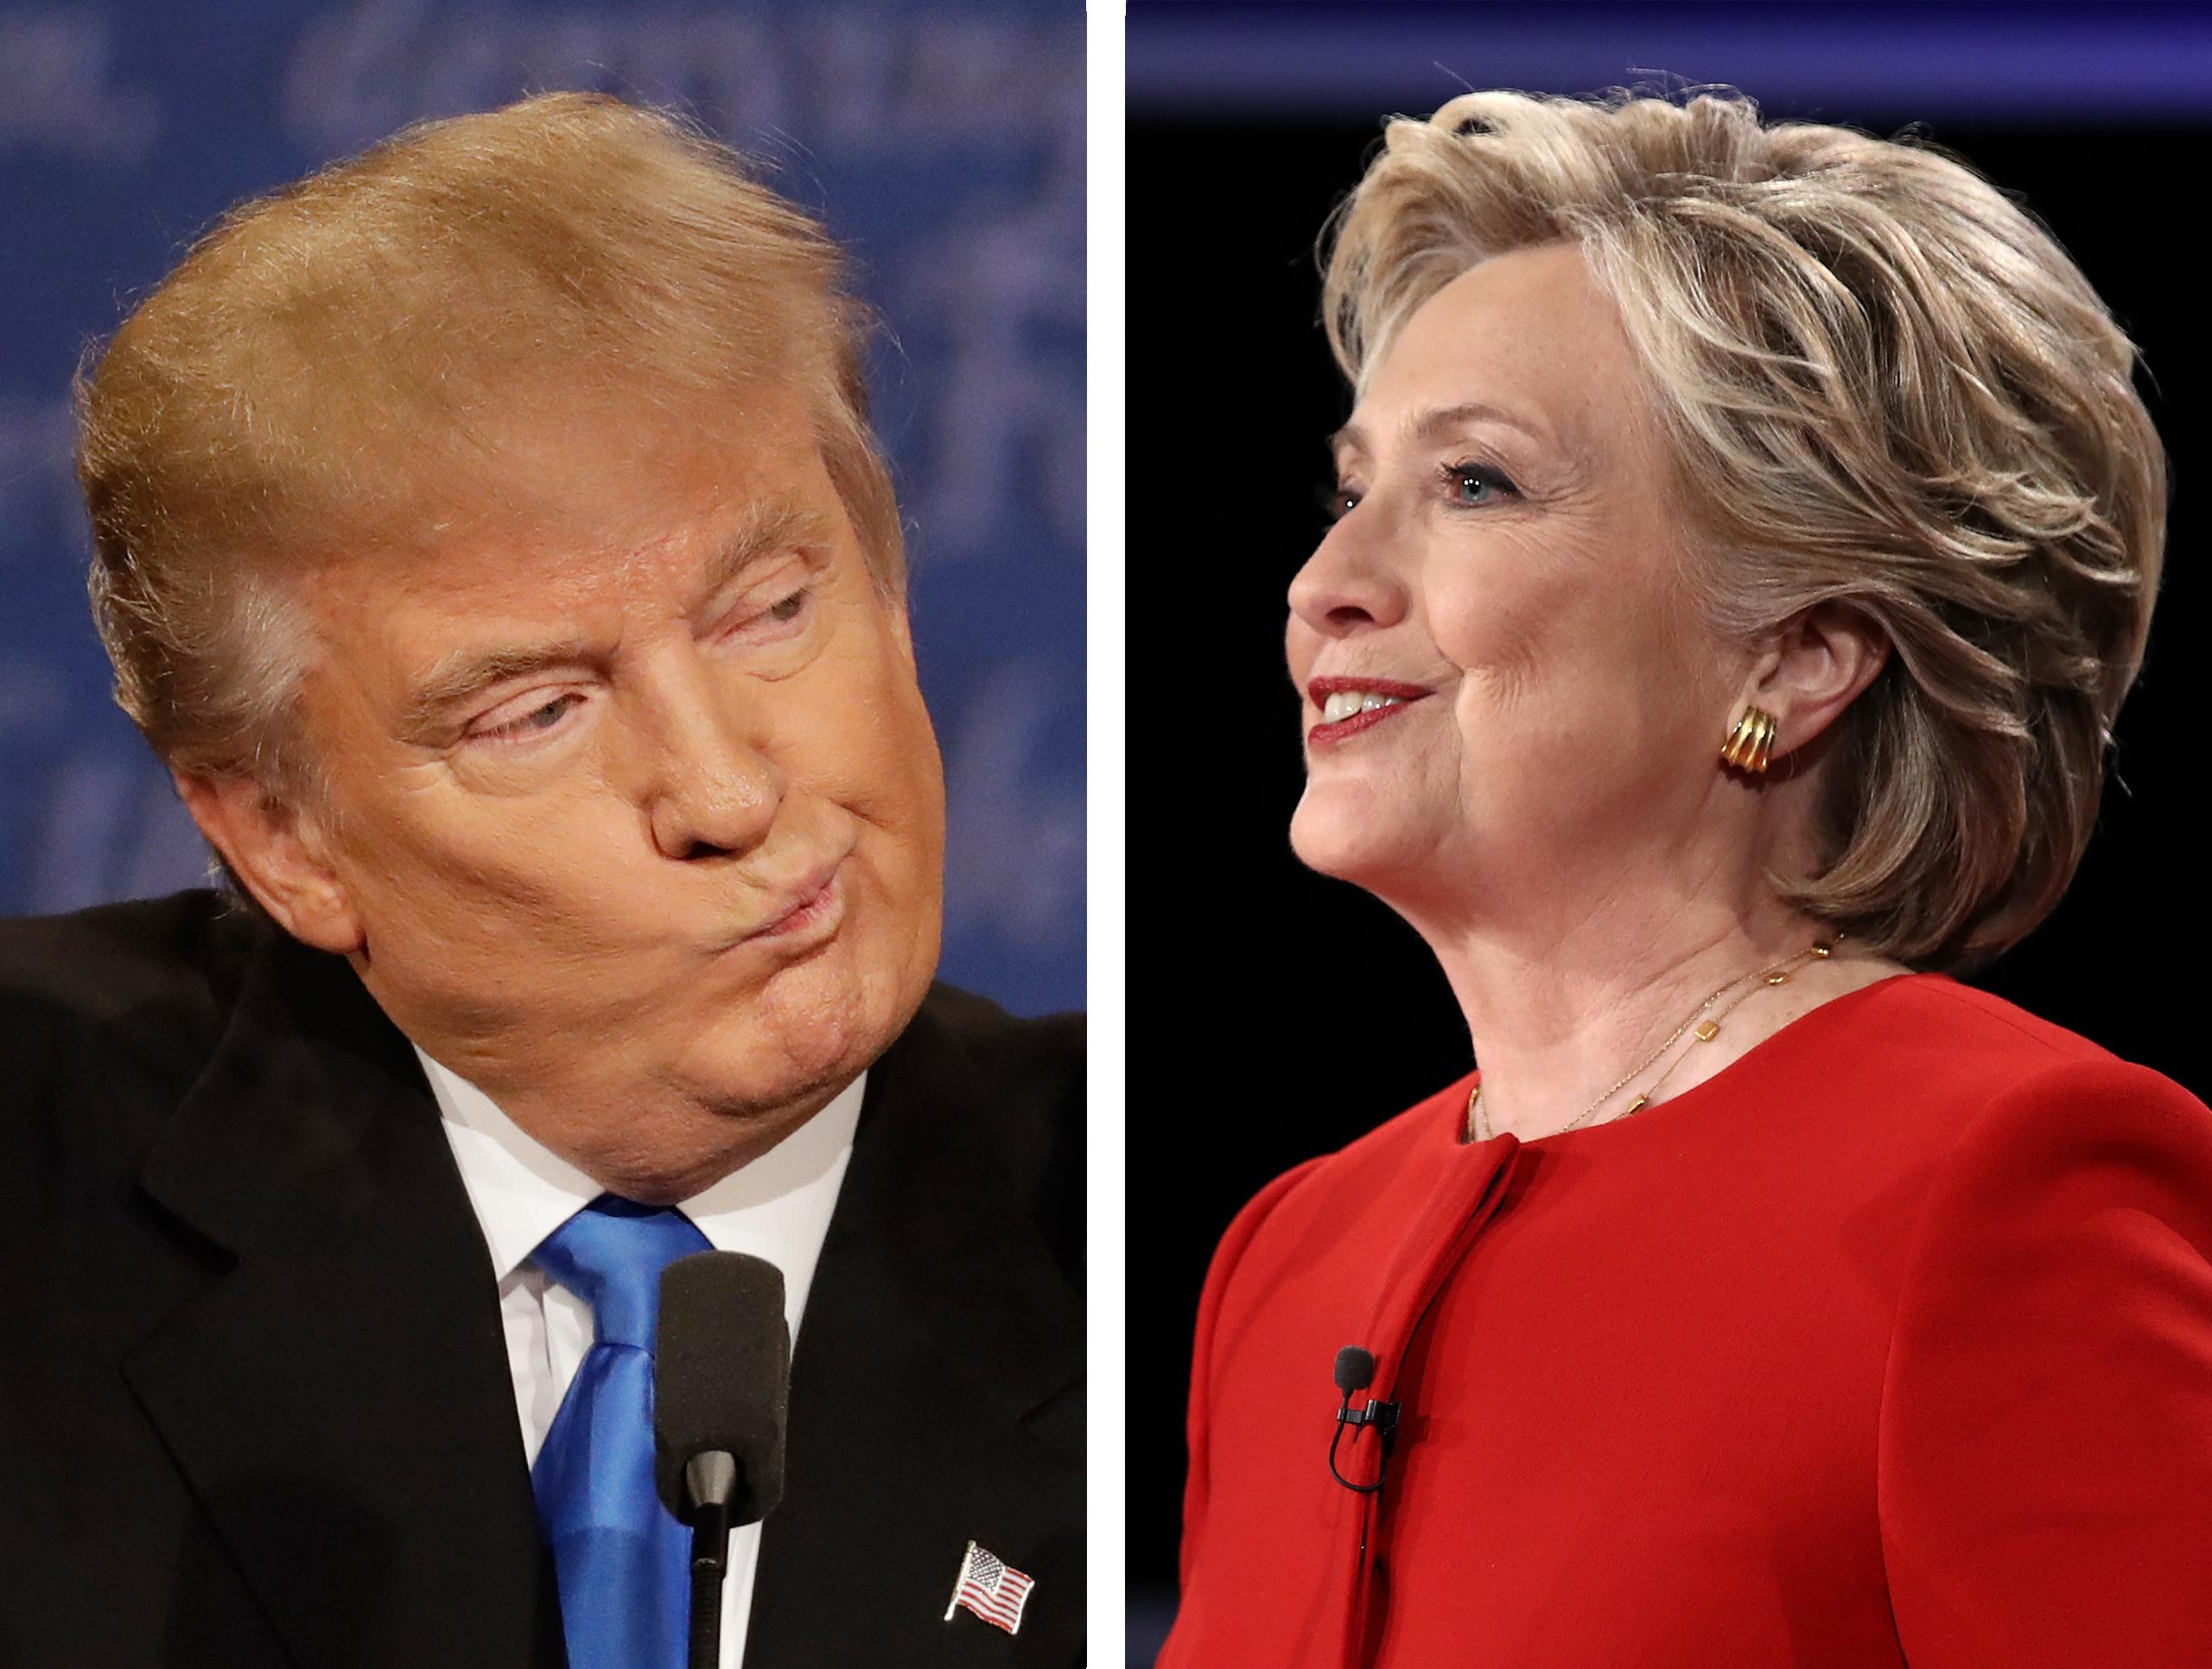 Left: Republican presidential nominee Donald Trump; Right: Democratic presidential nominee Hillary Clinton.